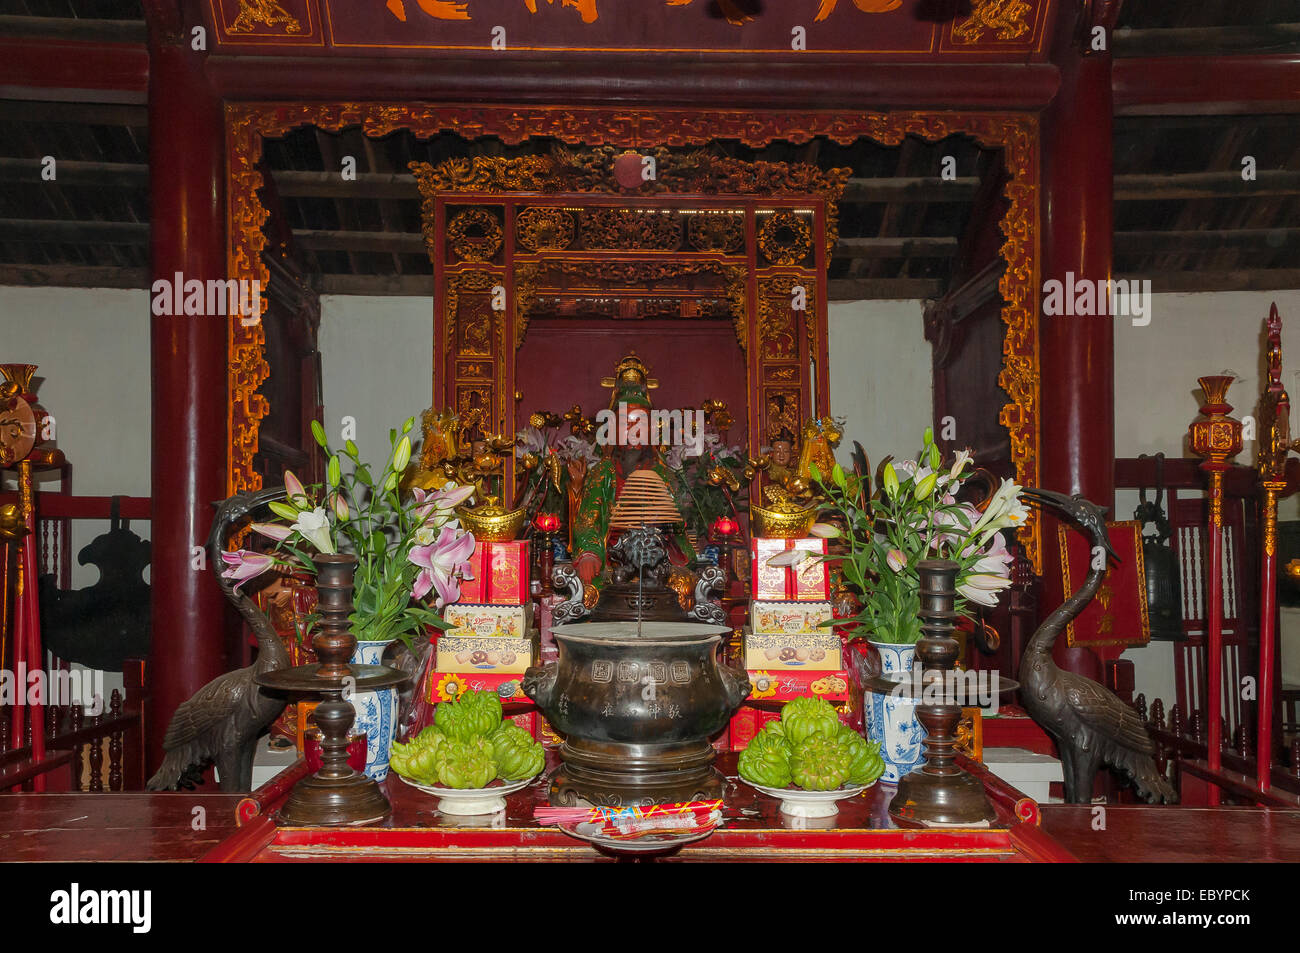 Inside Ngoc Son Temple, Hanoi, Vietnam - Stock Image